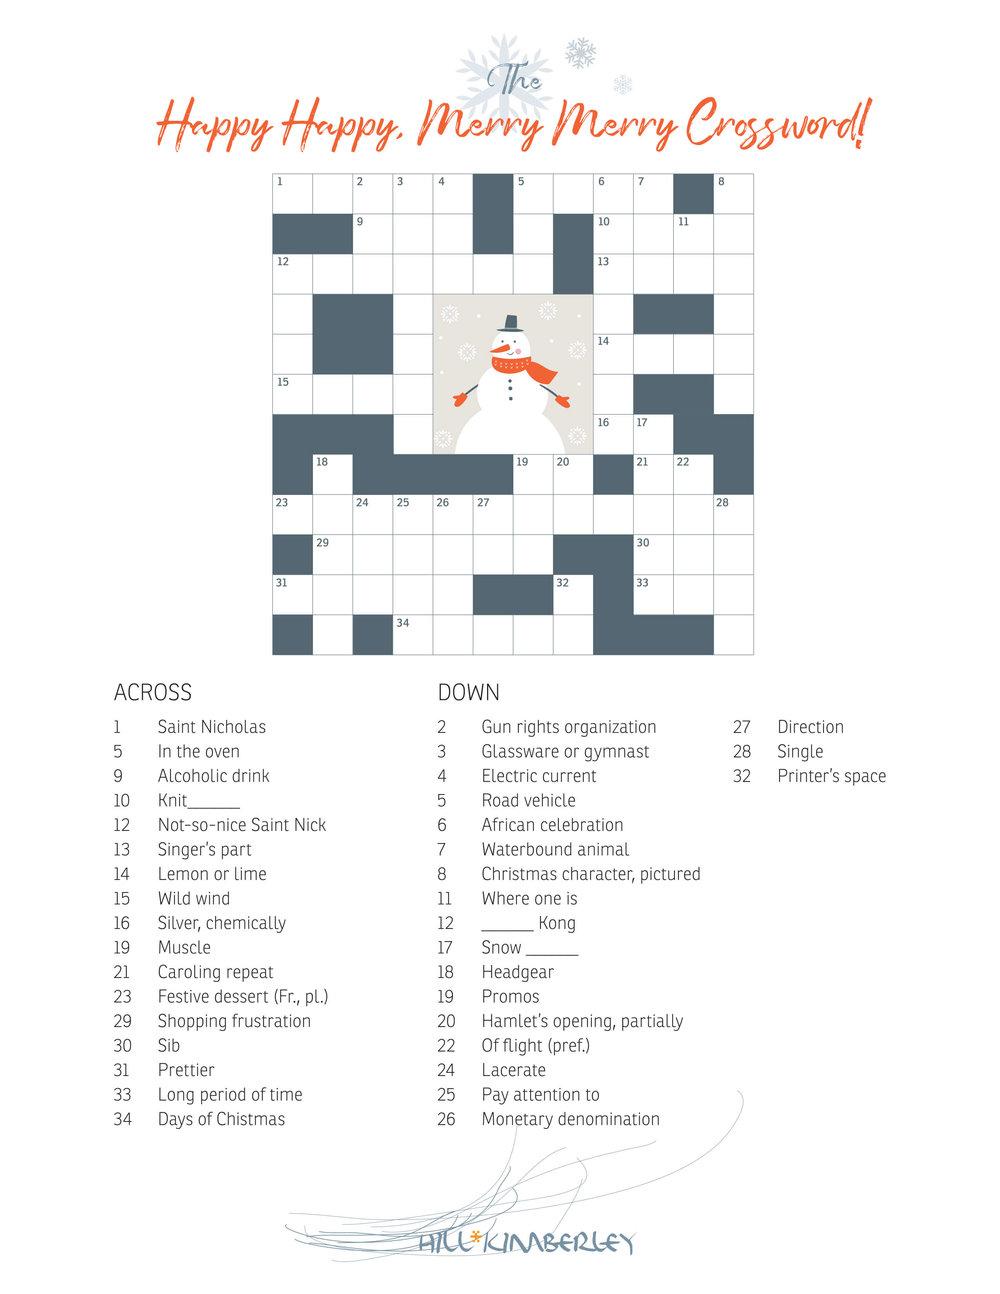 Hill-Kimberley_Christmas crossword 2018.jpg